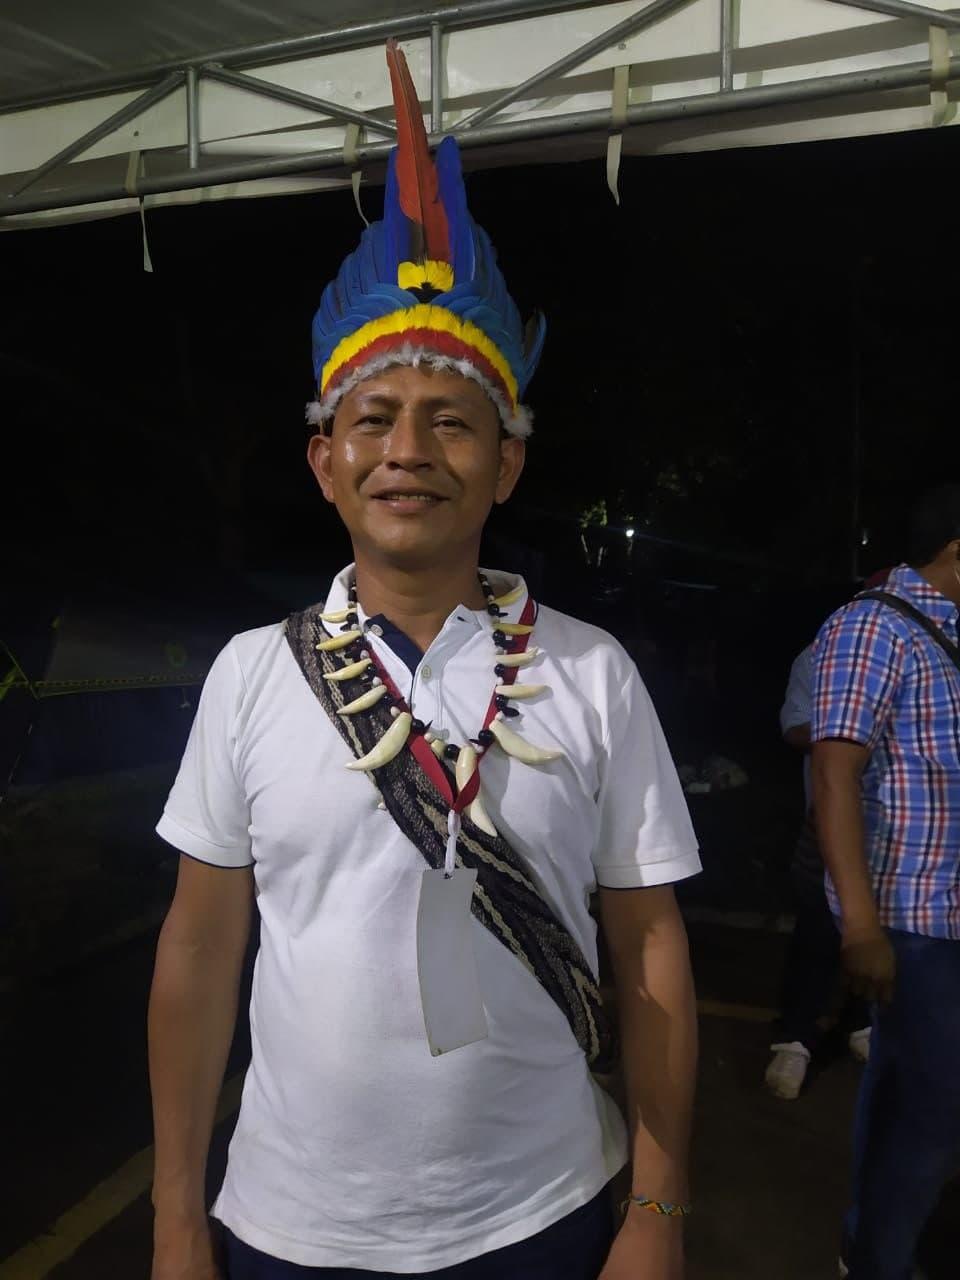 Consejero Mayor Orlando Rayo Acosta